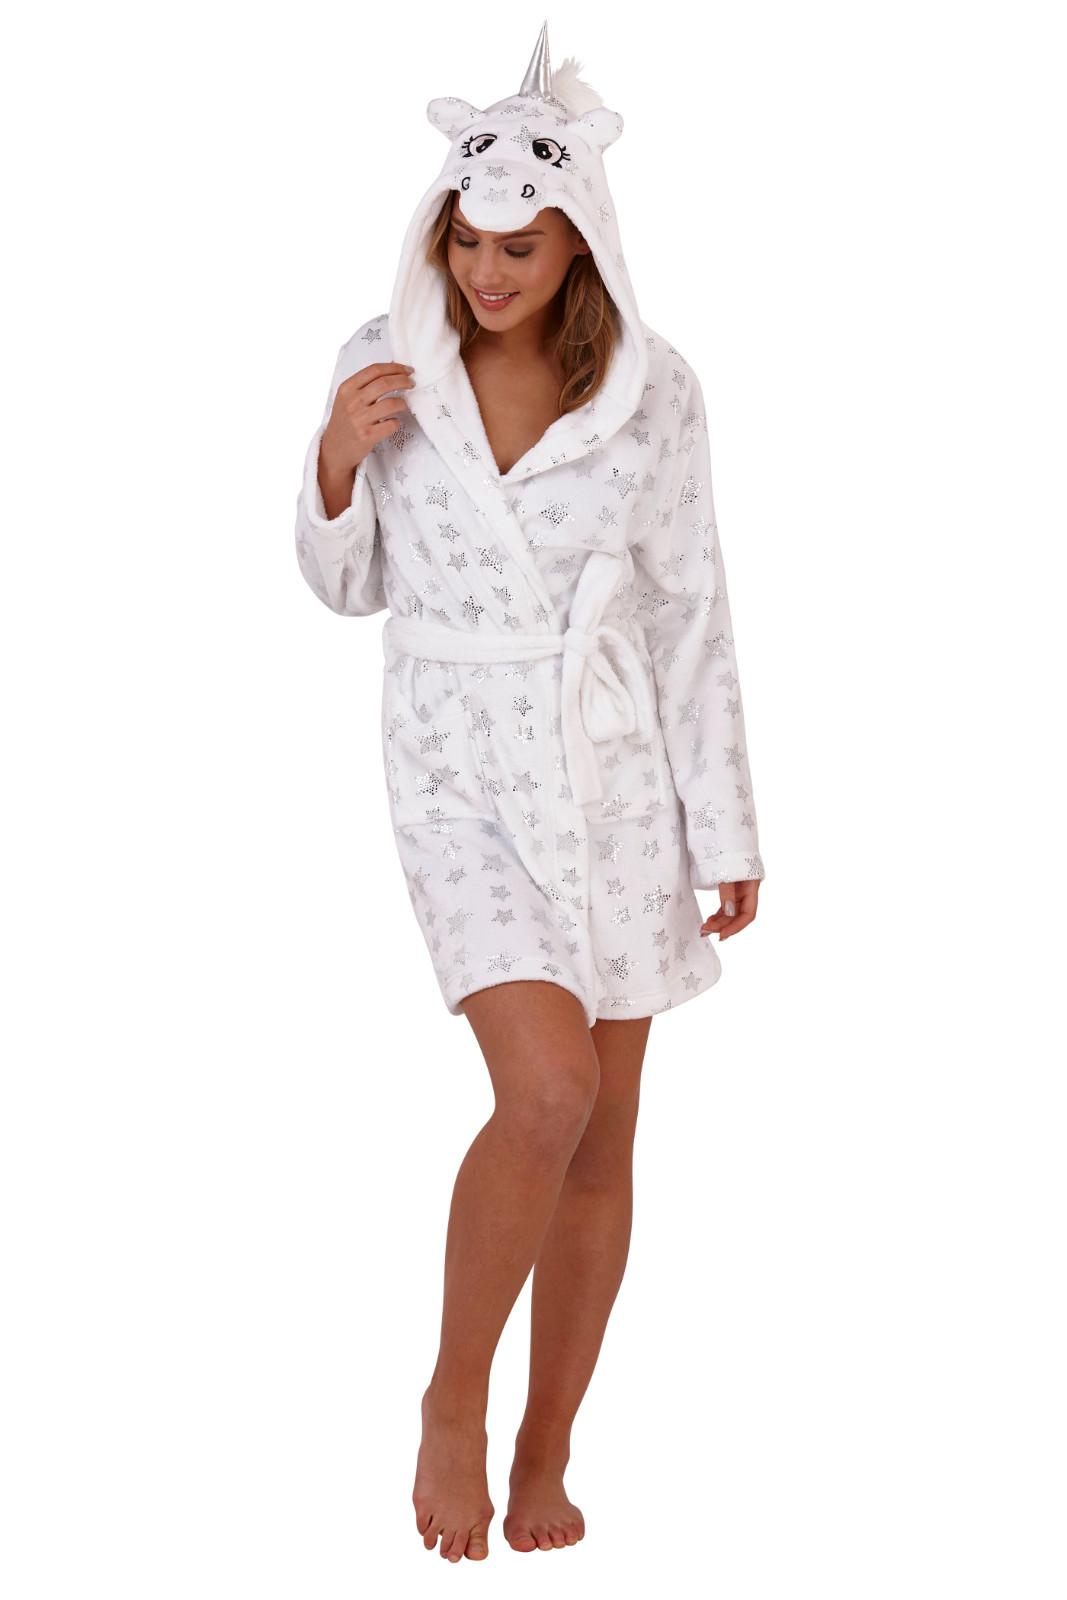 eddc12da79 Womens Star Unicorn Dressing Gown 3D Character Luxury Hooded Fleece Bath  Robe